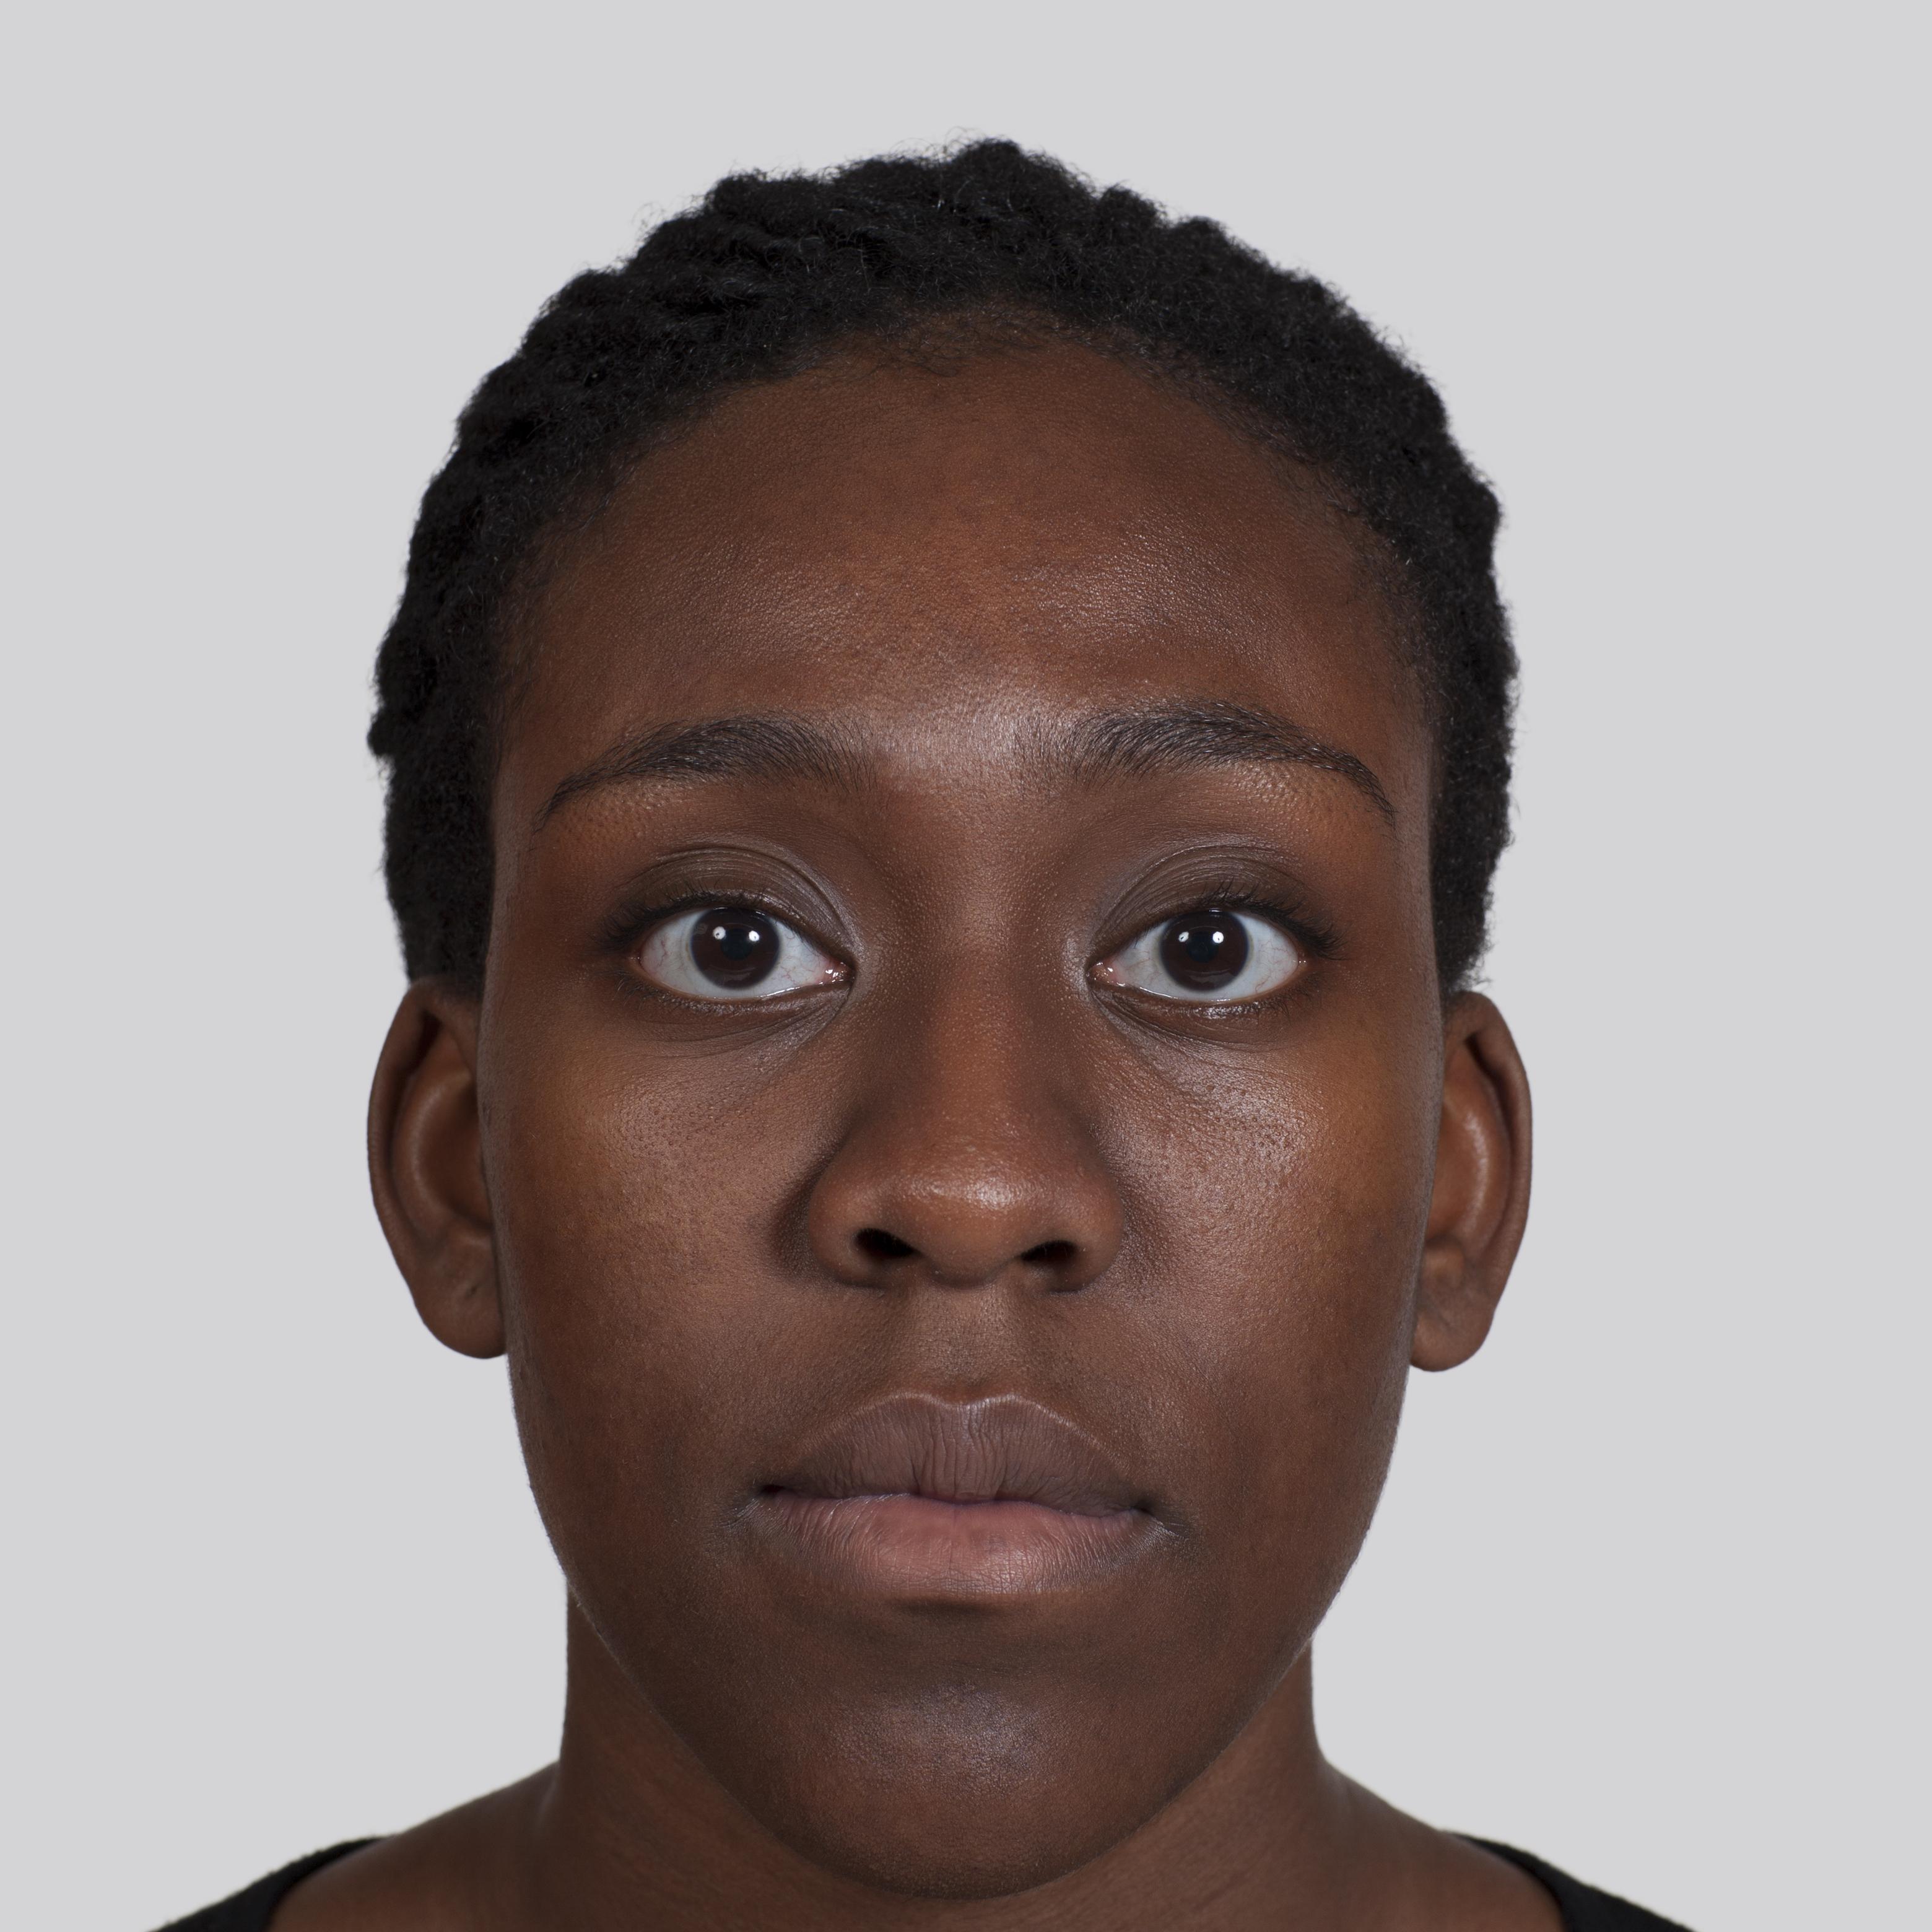 Black Female 1